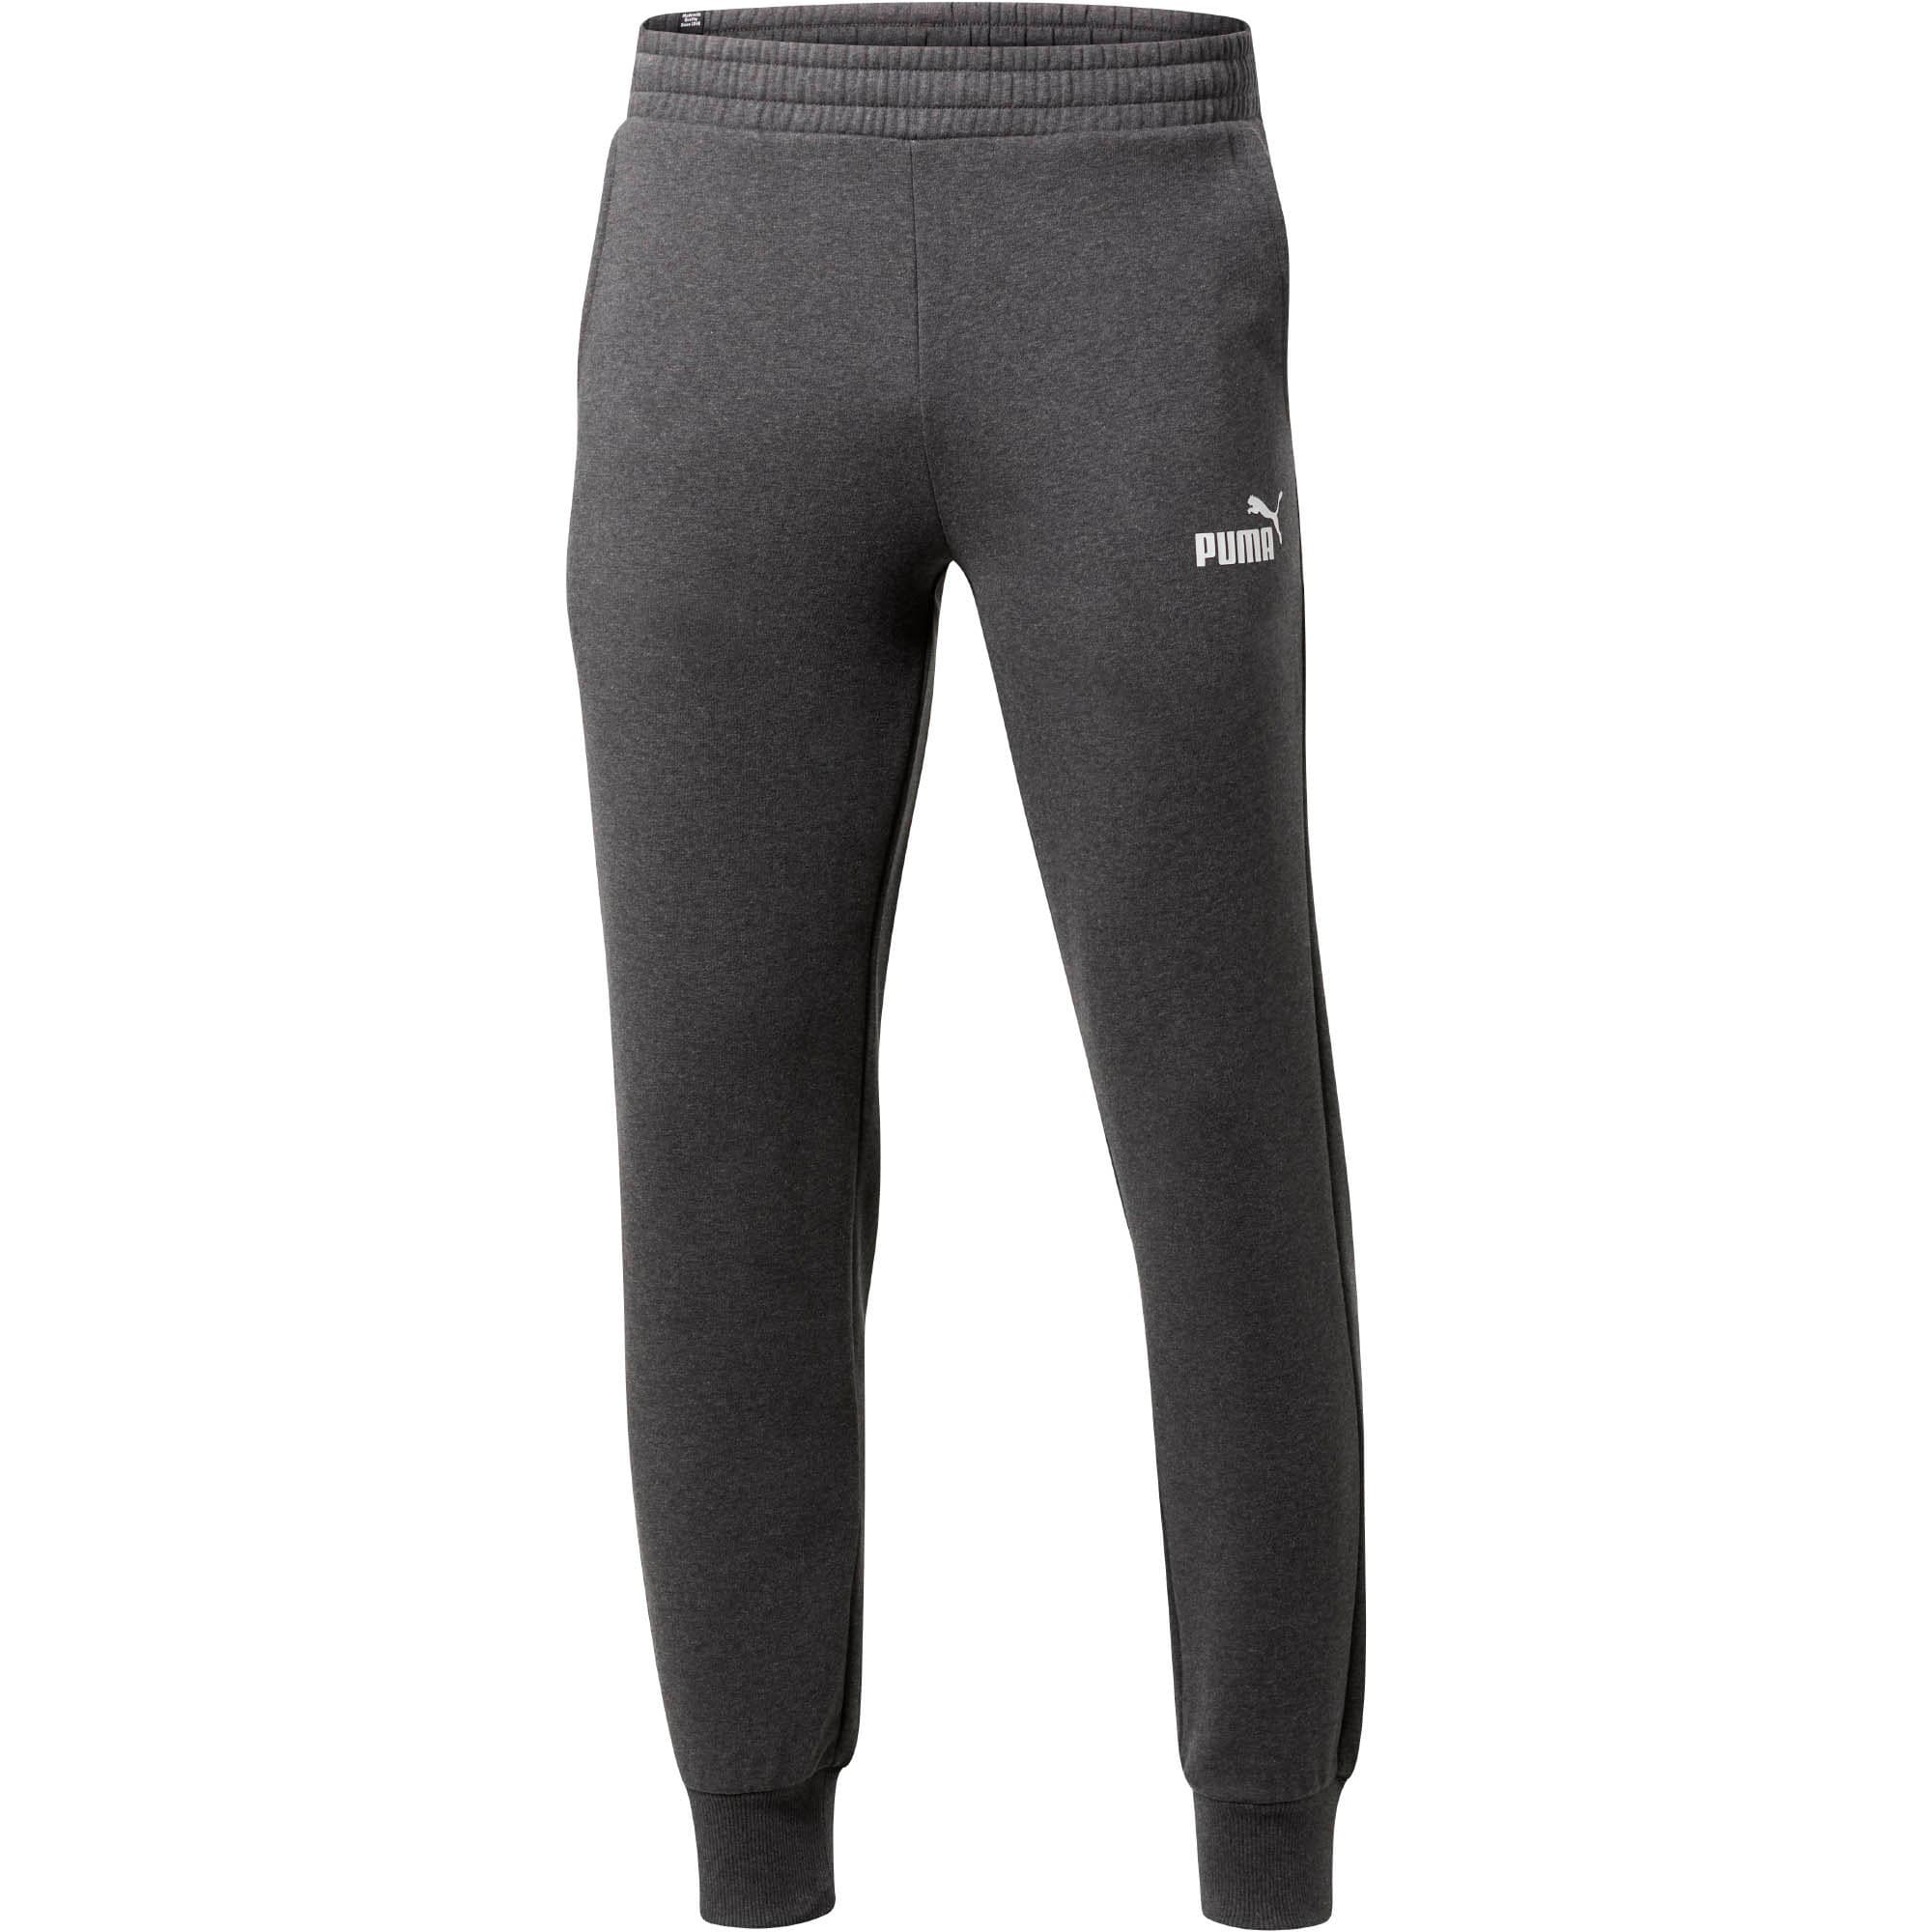 Thumbnail 1 of Essentials Men's Fleece Knit Pants, Dark Gray Heather, medium